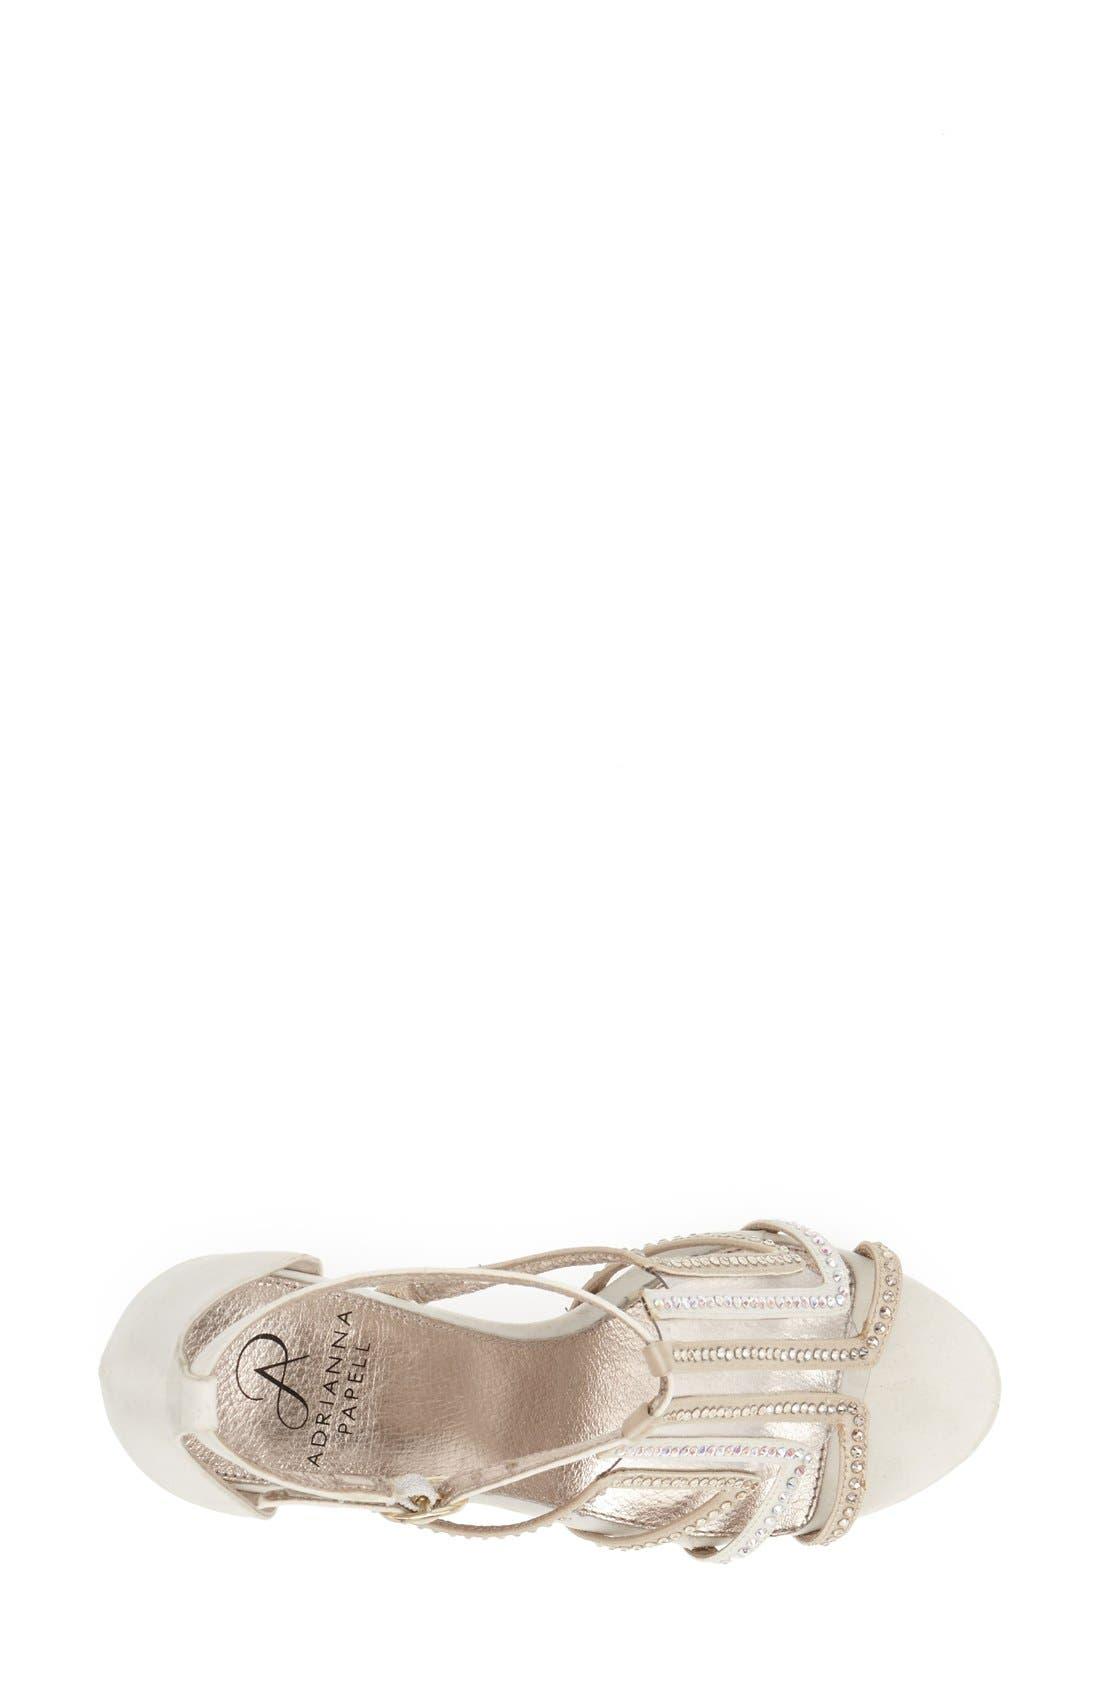 Alternate Image 3  - Adrianna Papell 'Emilia' Sandal (Online Only Color)